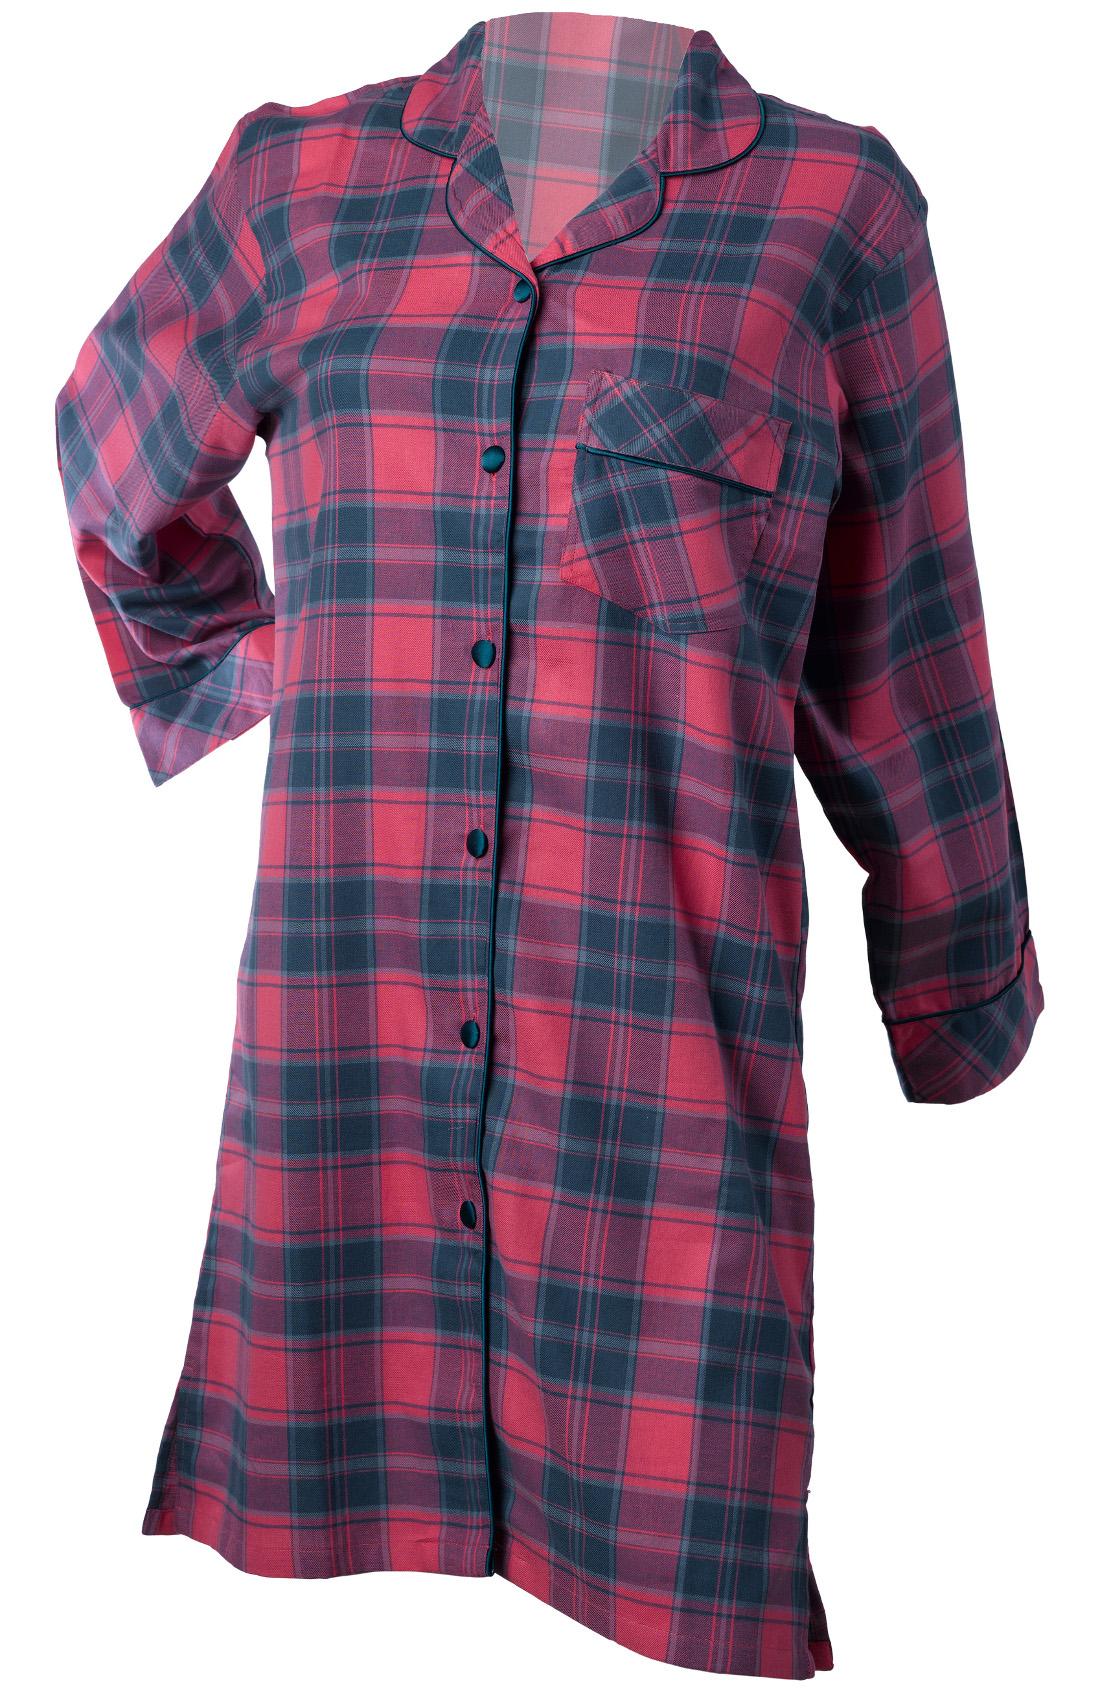 Womens Tartan Nightie Long Sleeved Button Up Strawberry Check Cotton Nightshirt